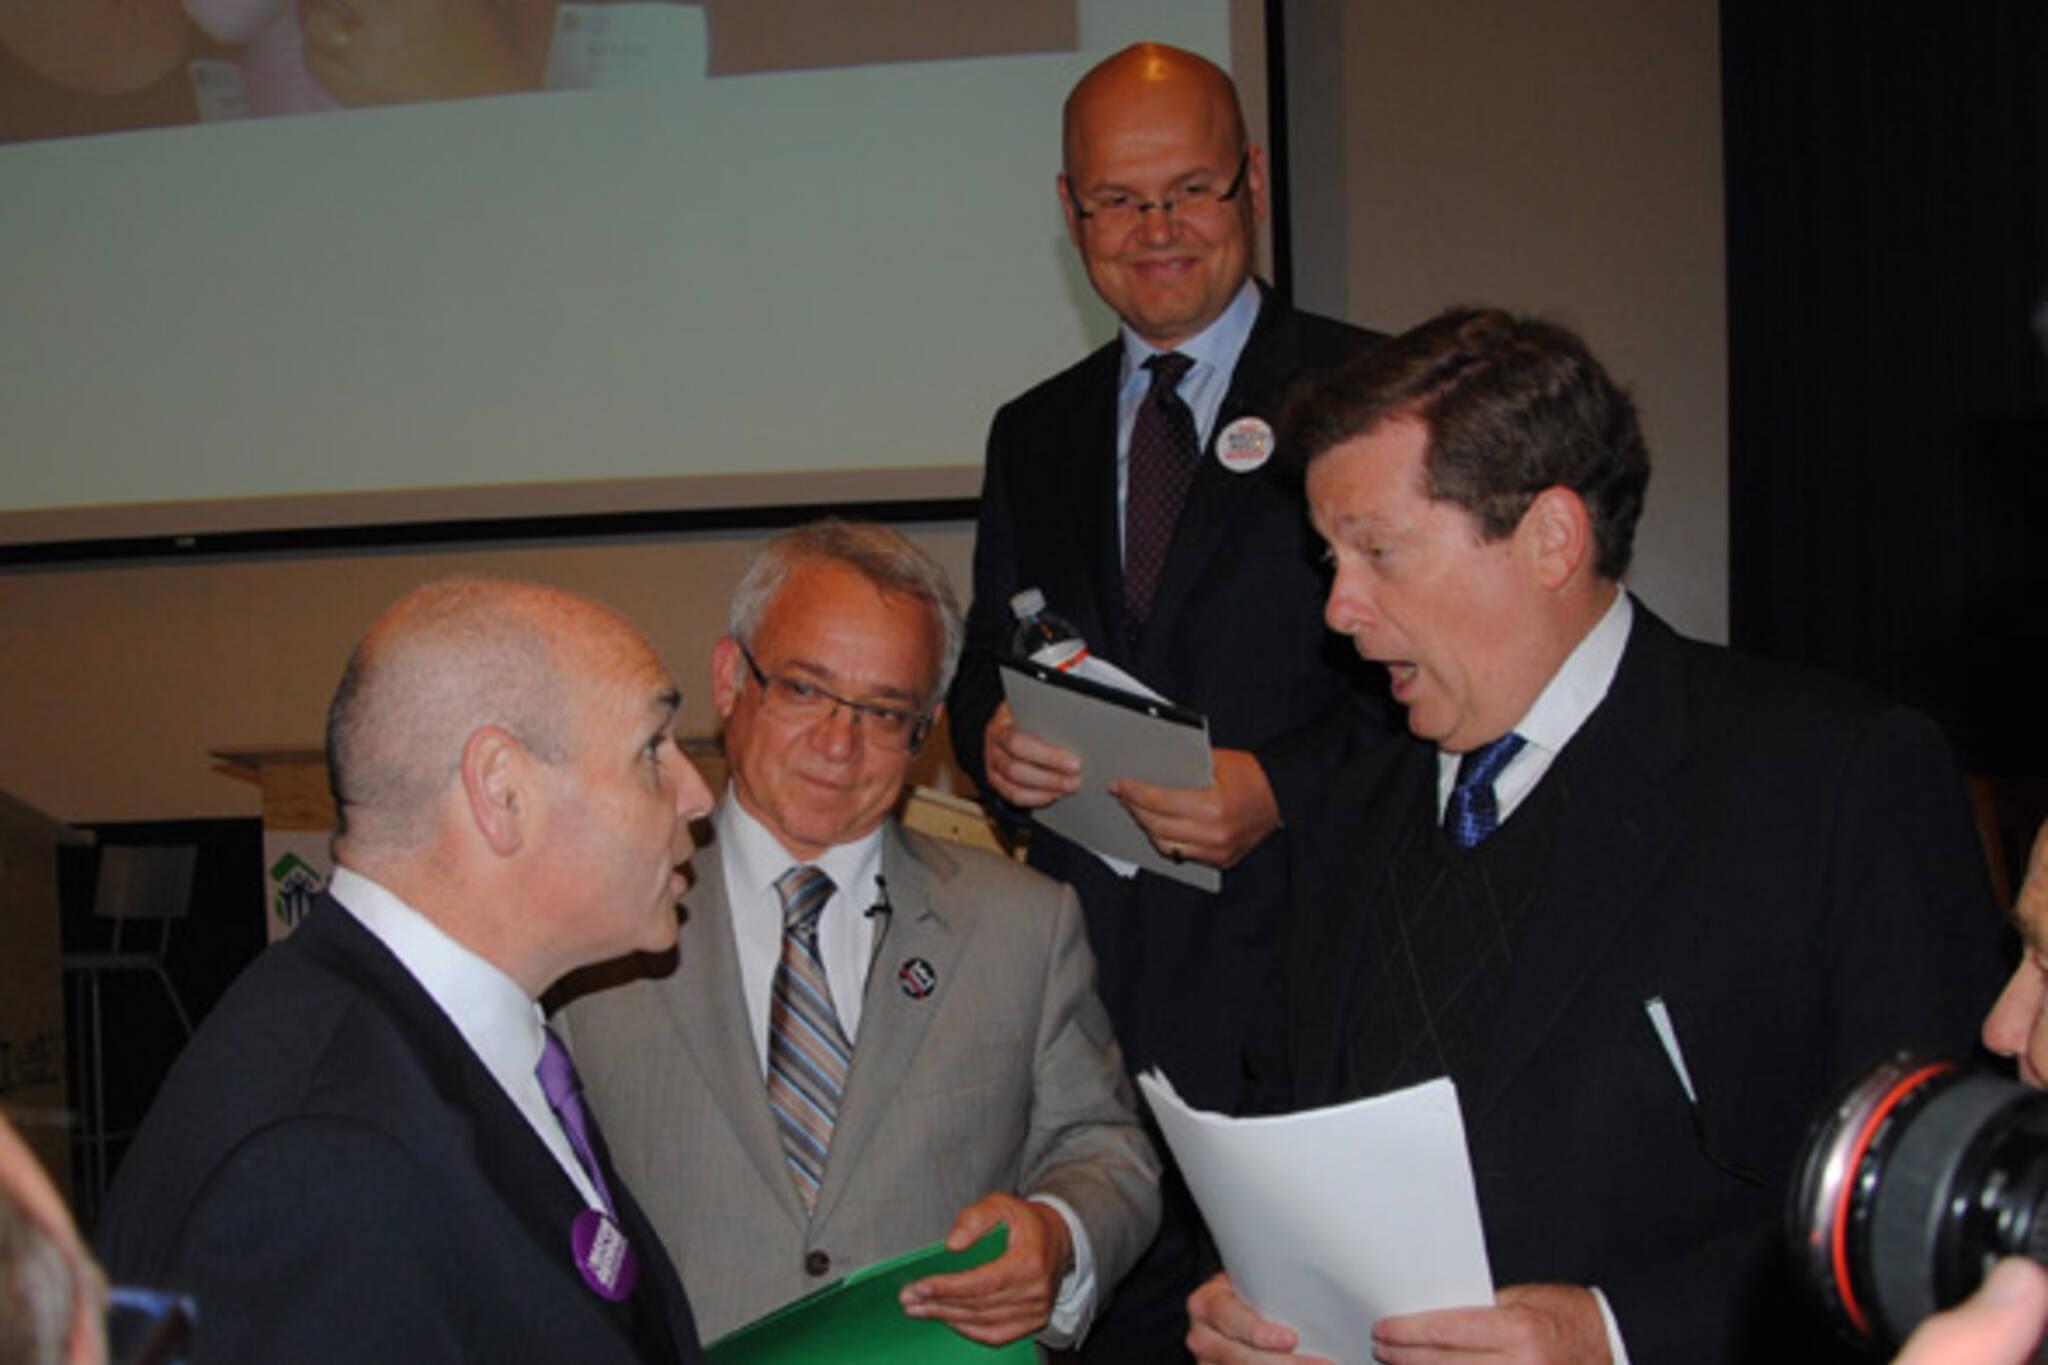 toronto mayoral race 2010